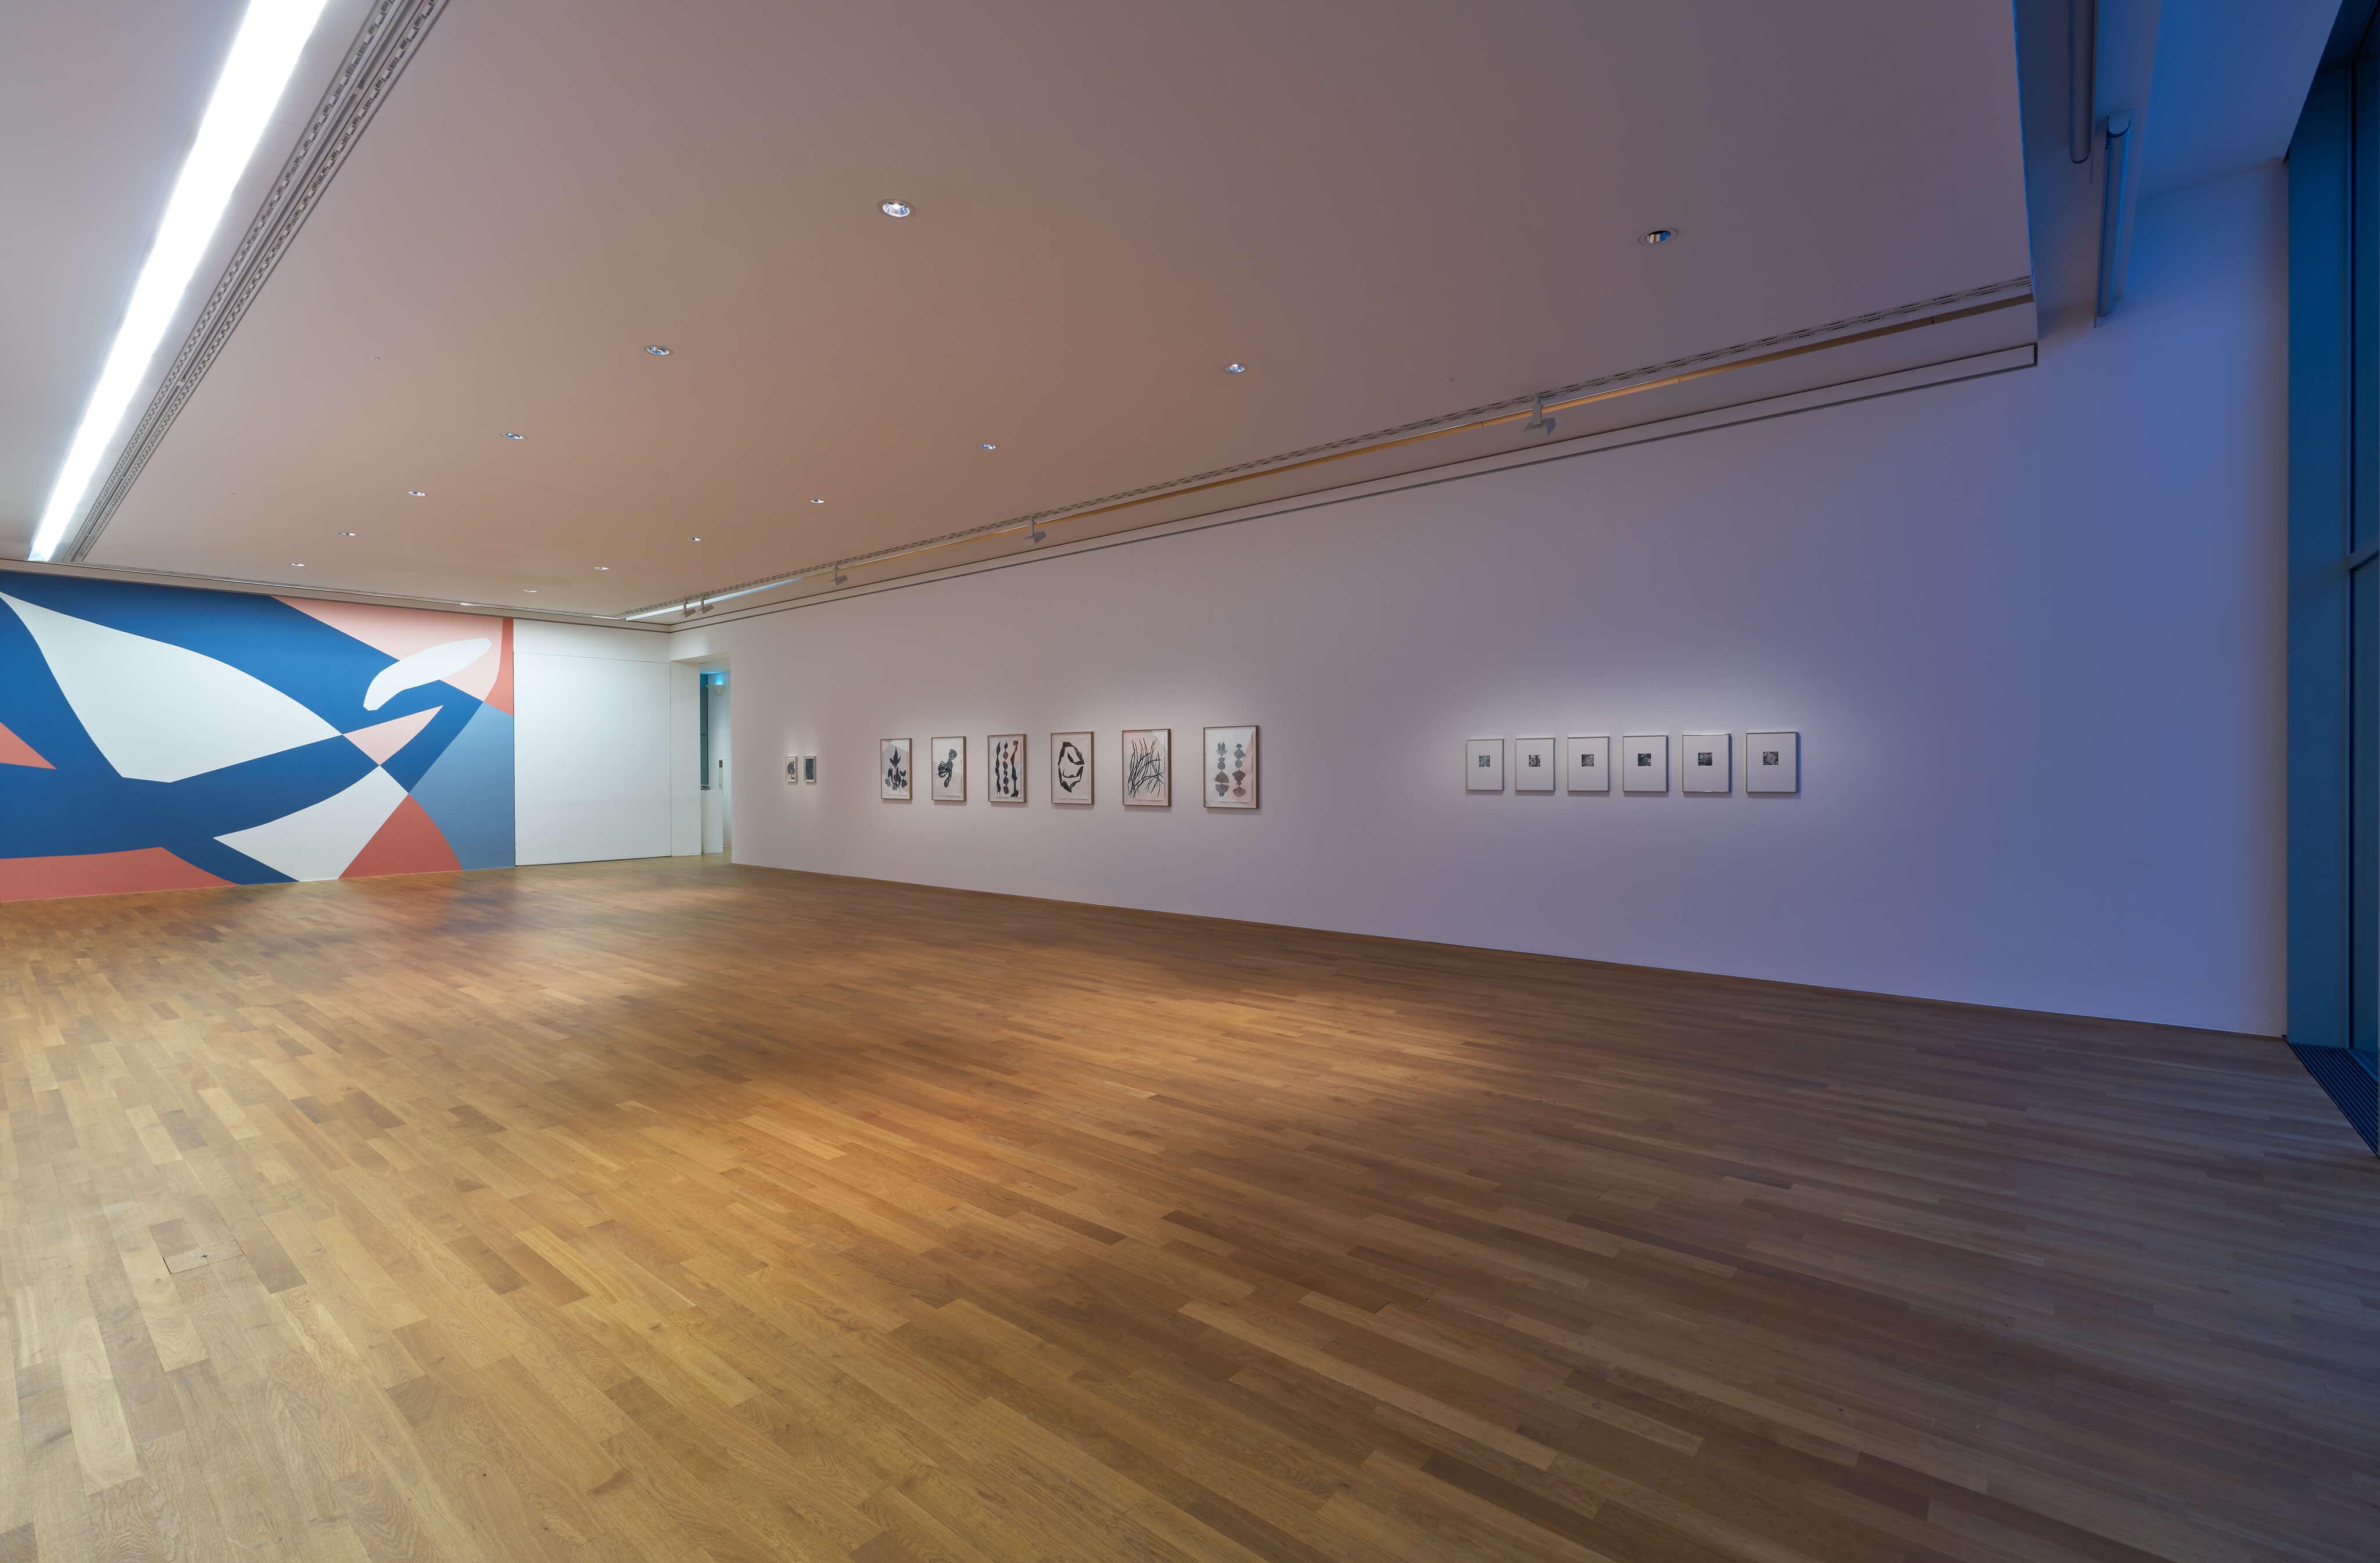 20181024_Installation_Frauke Dannert_0037 Kopie